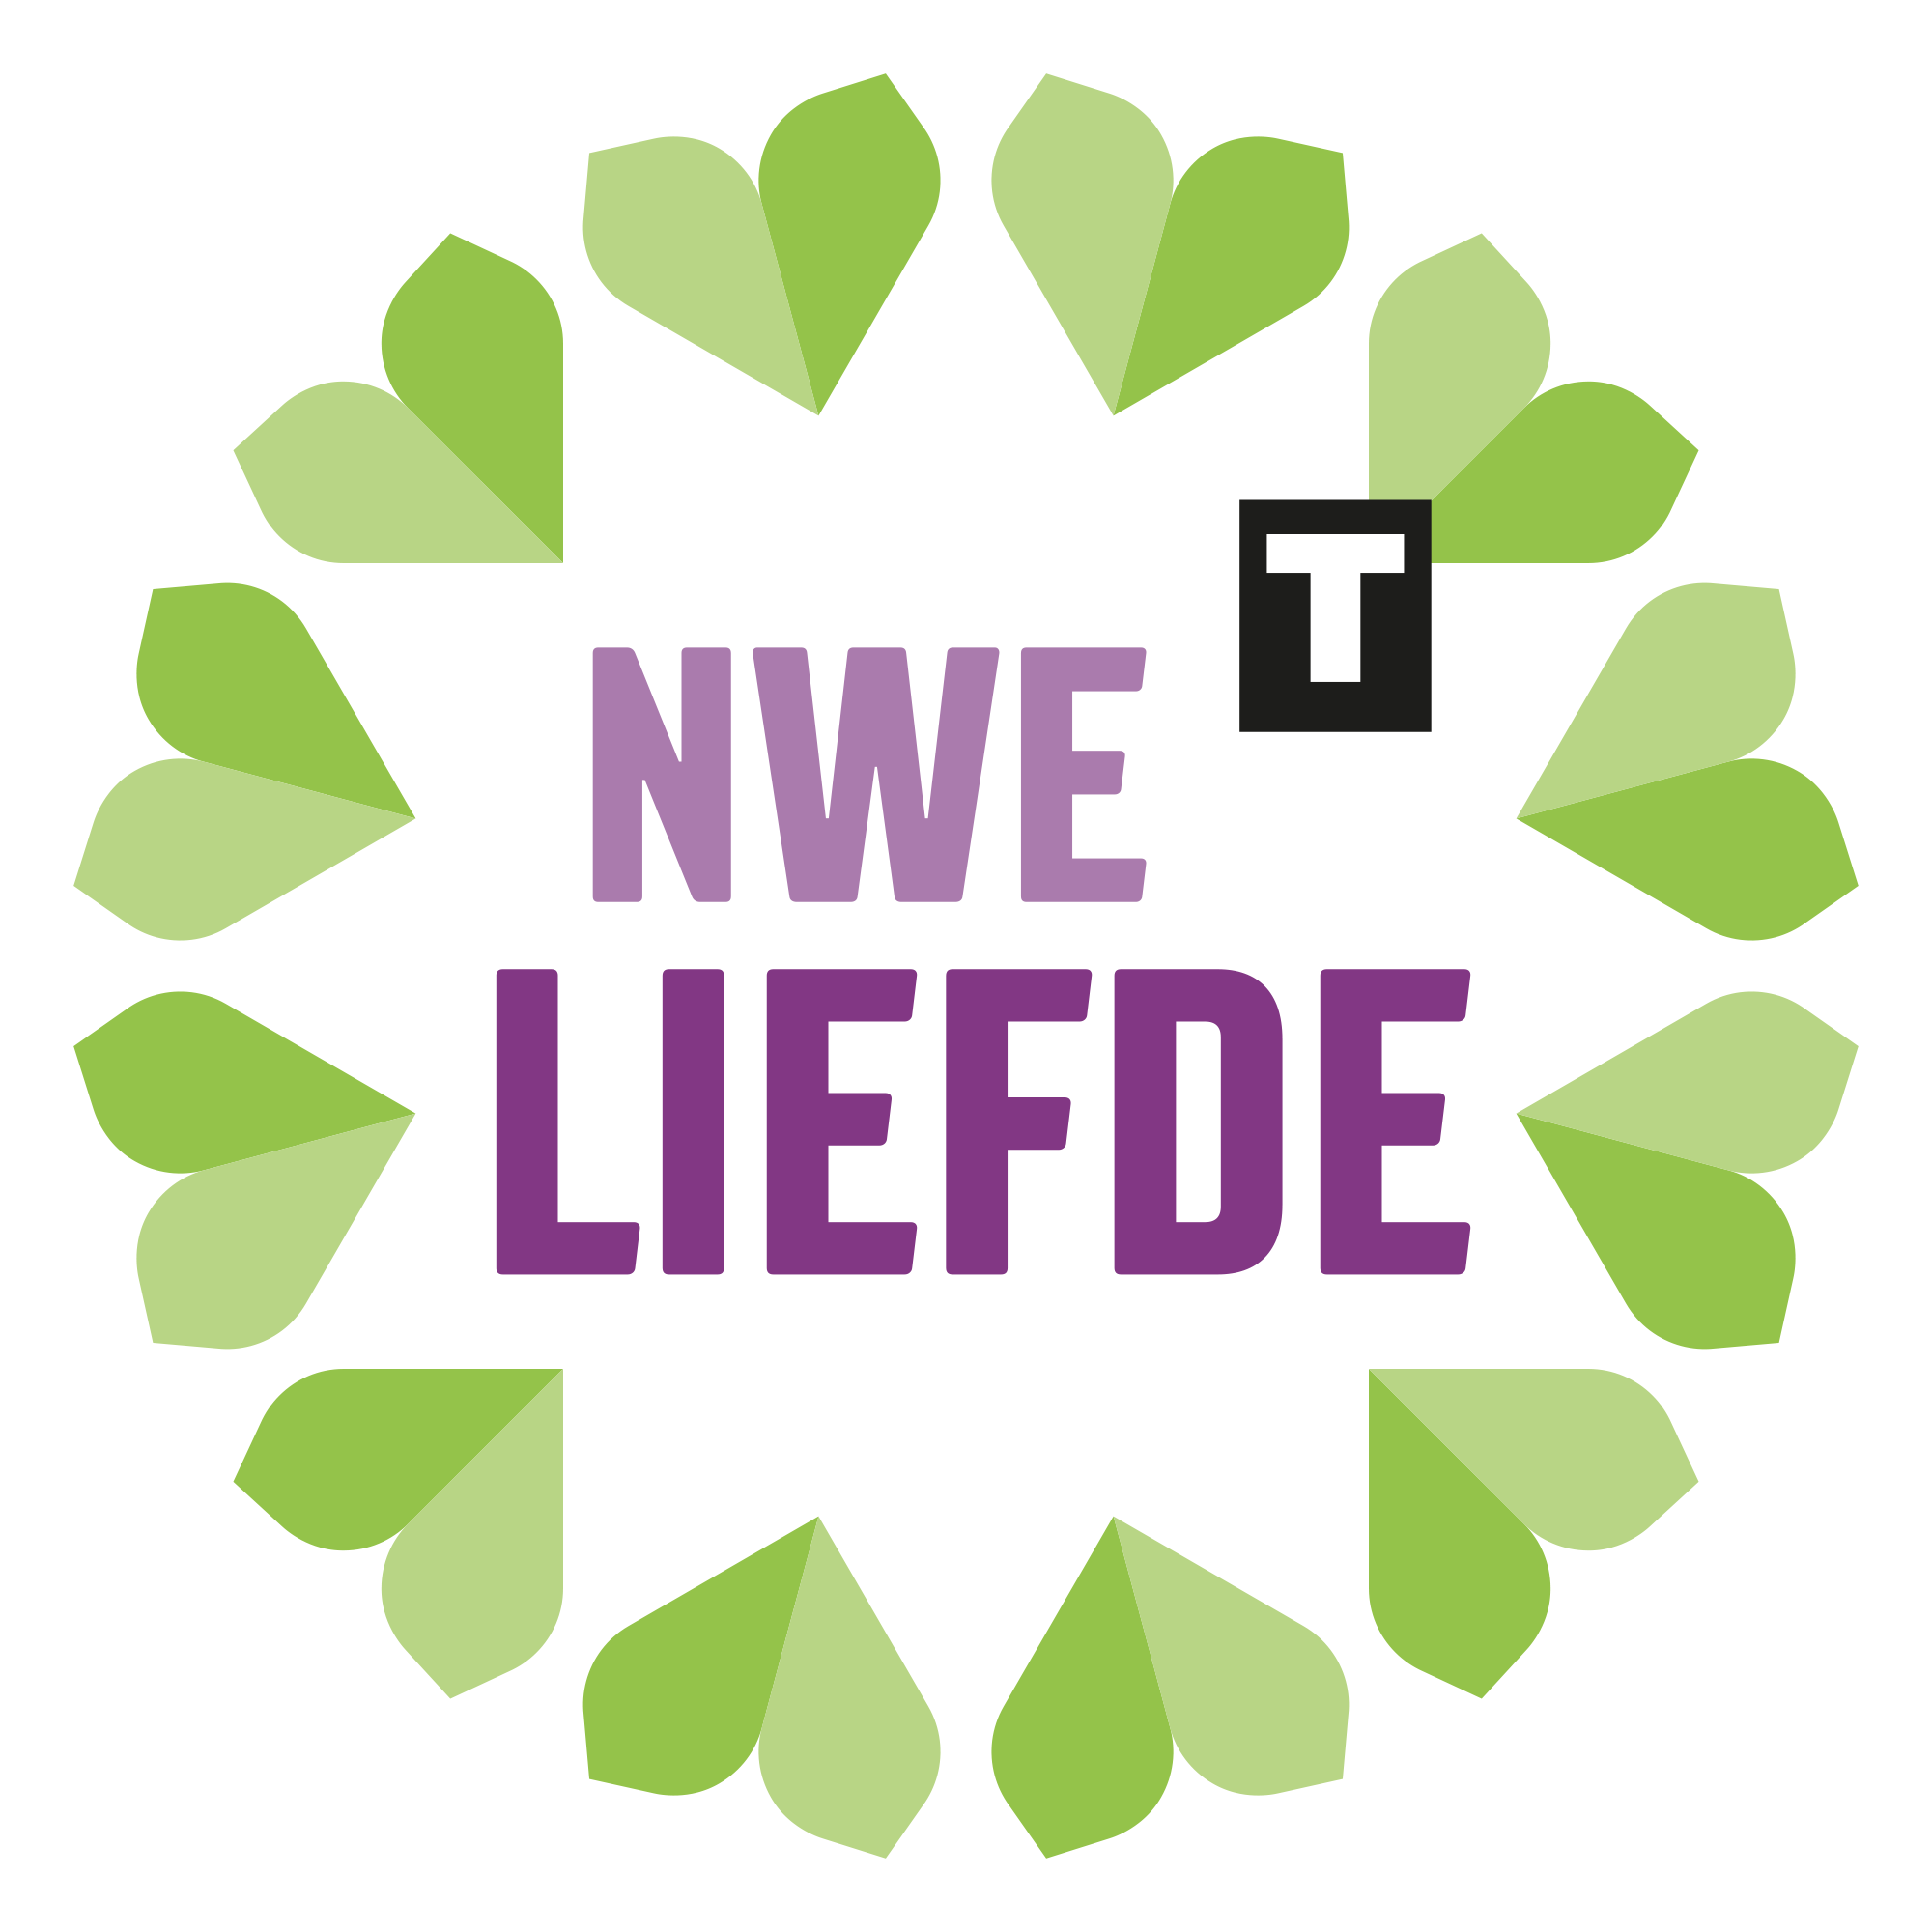 Nieuwe Liefde Tilburg logo ontwerp JAgd